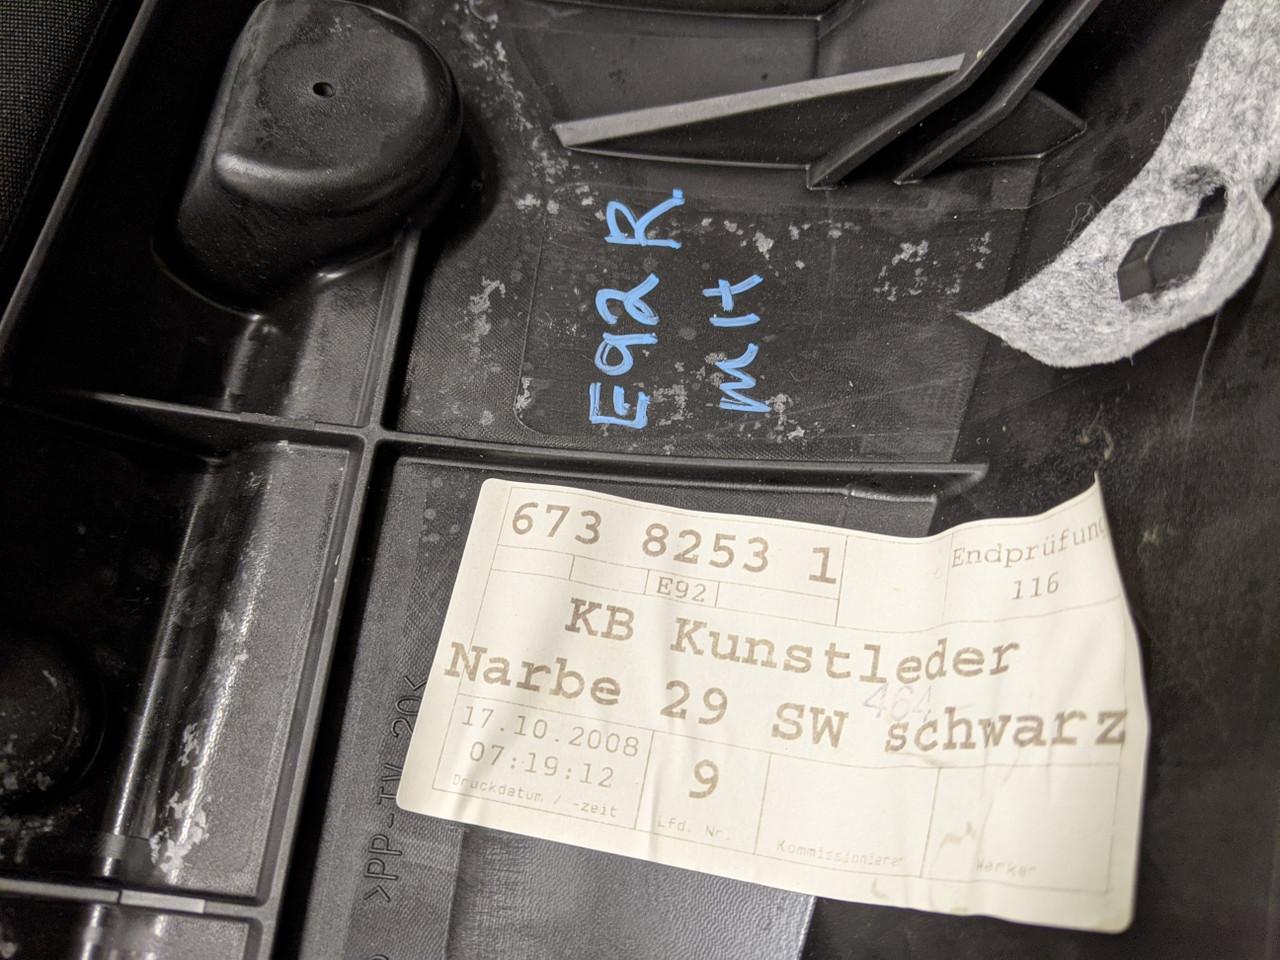 BMW E92 3-Series Coupe Rear Seat Bolster Right Sensatec Black 6738253